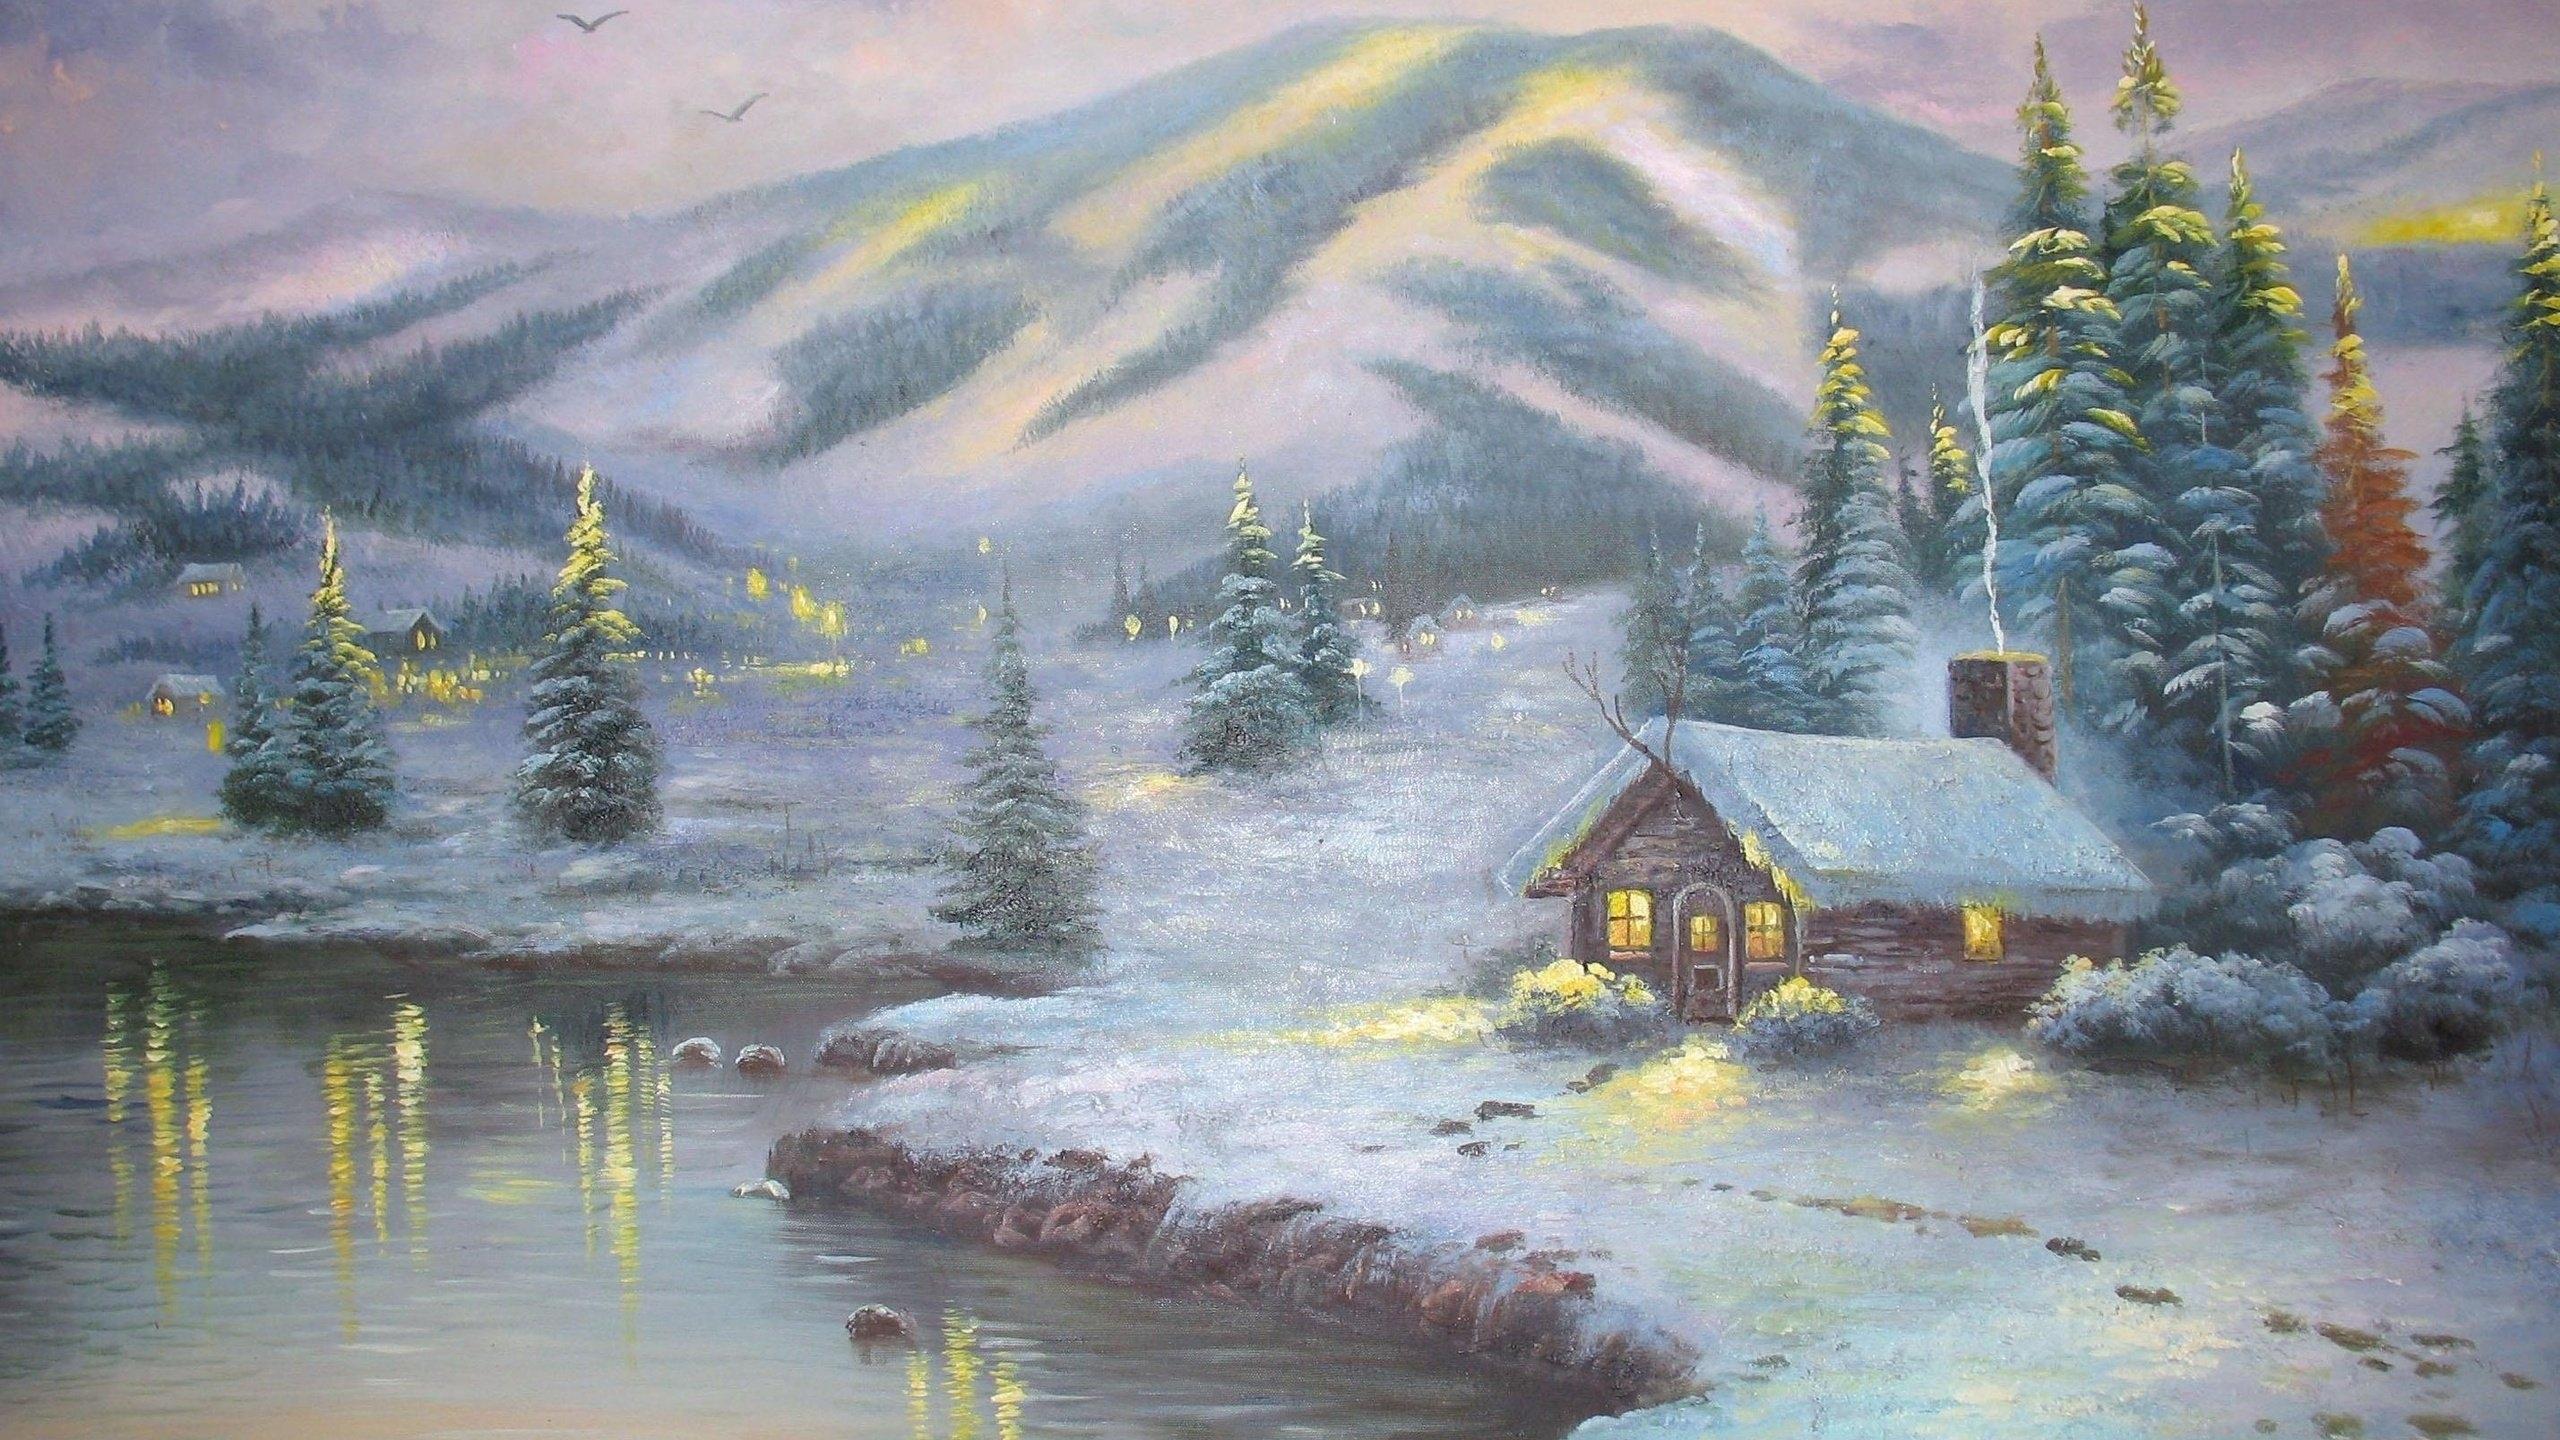 thomas kinkade winter - walldevil